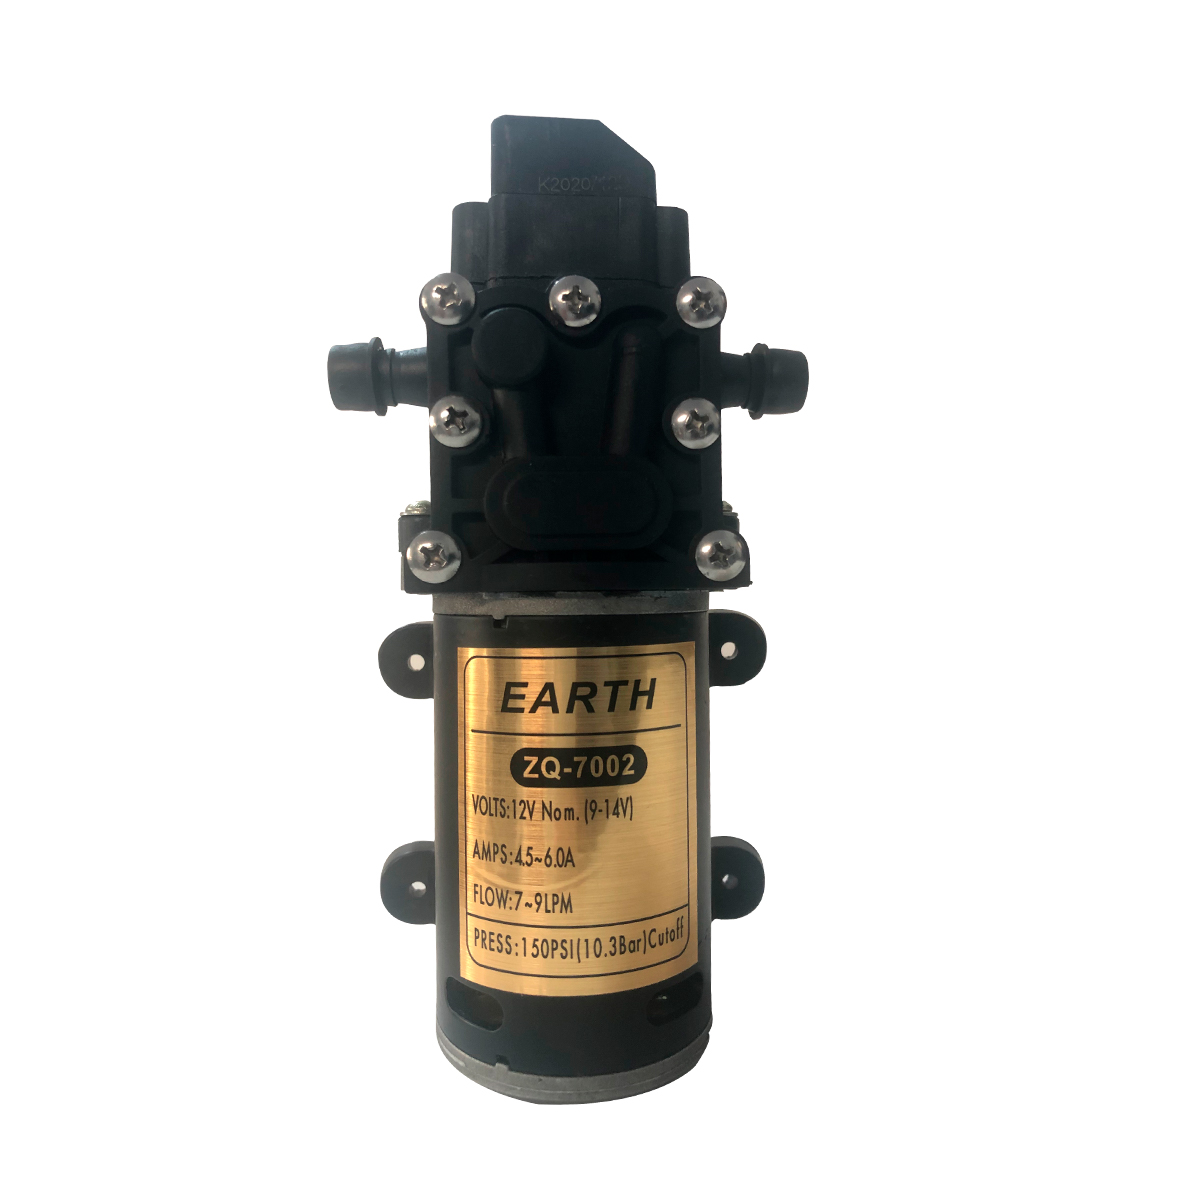 Kit Bomba Diafragma 150psi + Fonte colmeia 12V 10AH + Cabo P4 Fêmea + Cabo P4 Macho + Cabo de Energia Com Tomada 1,20MT